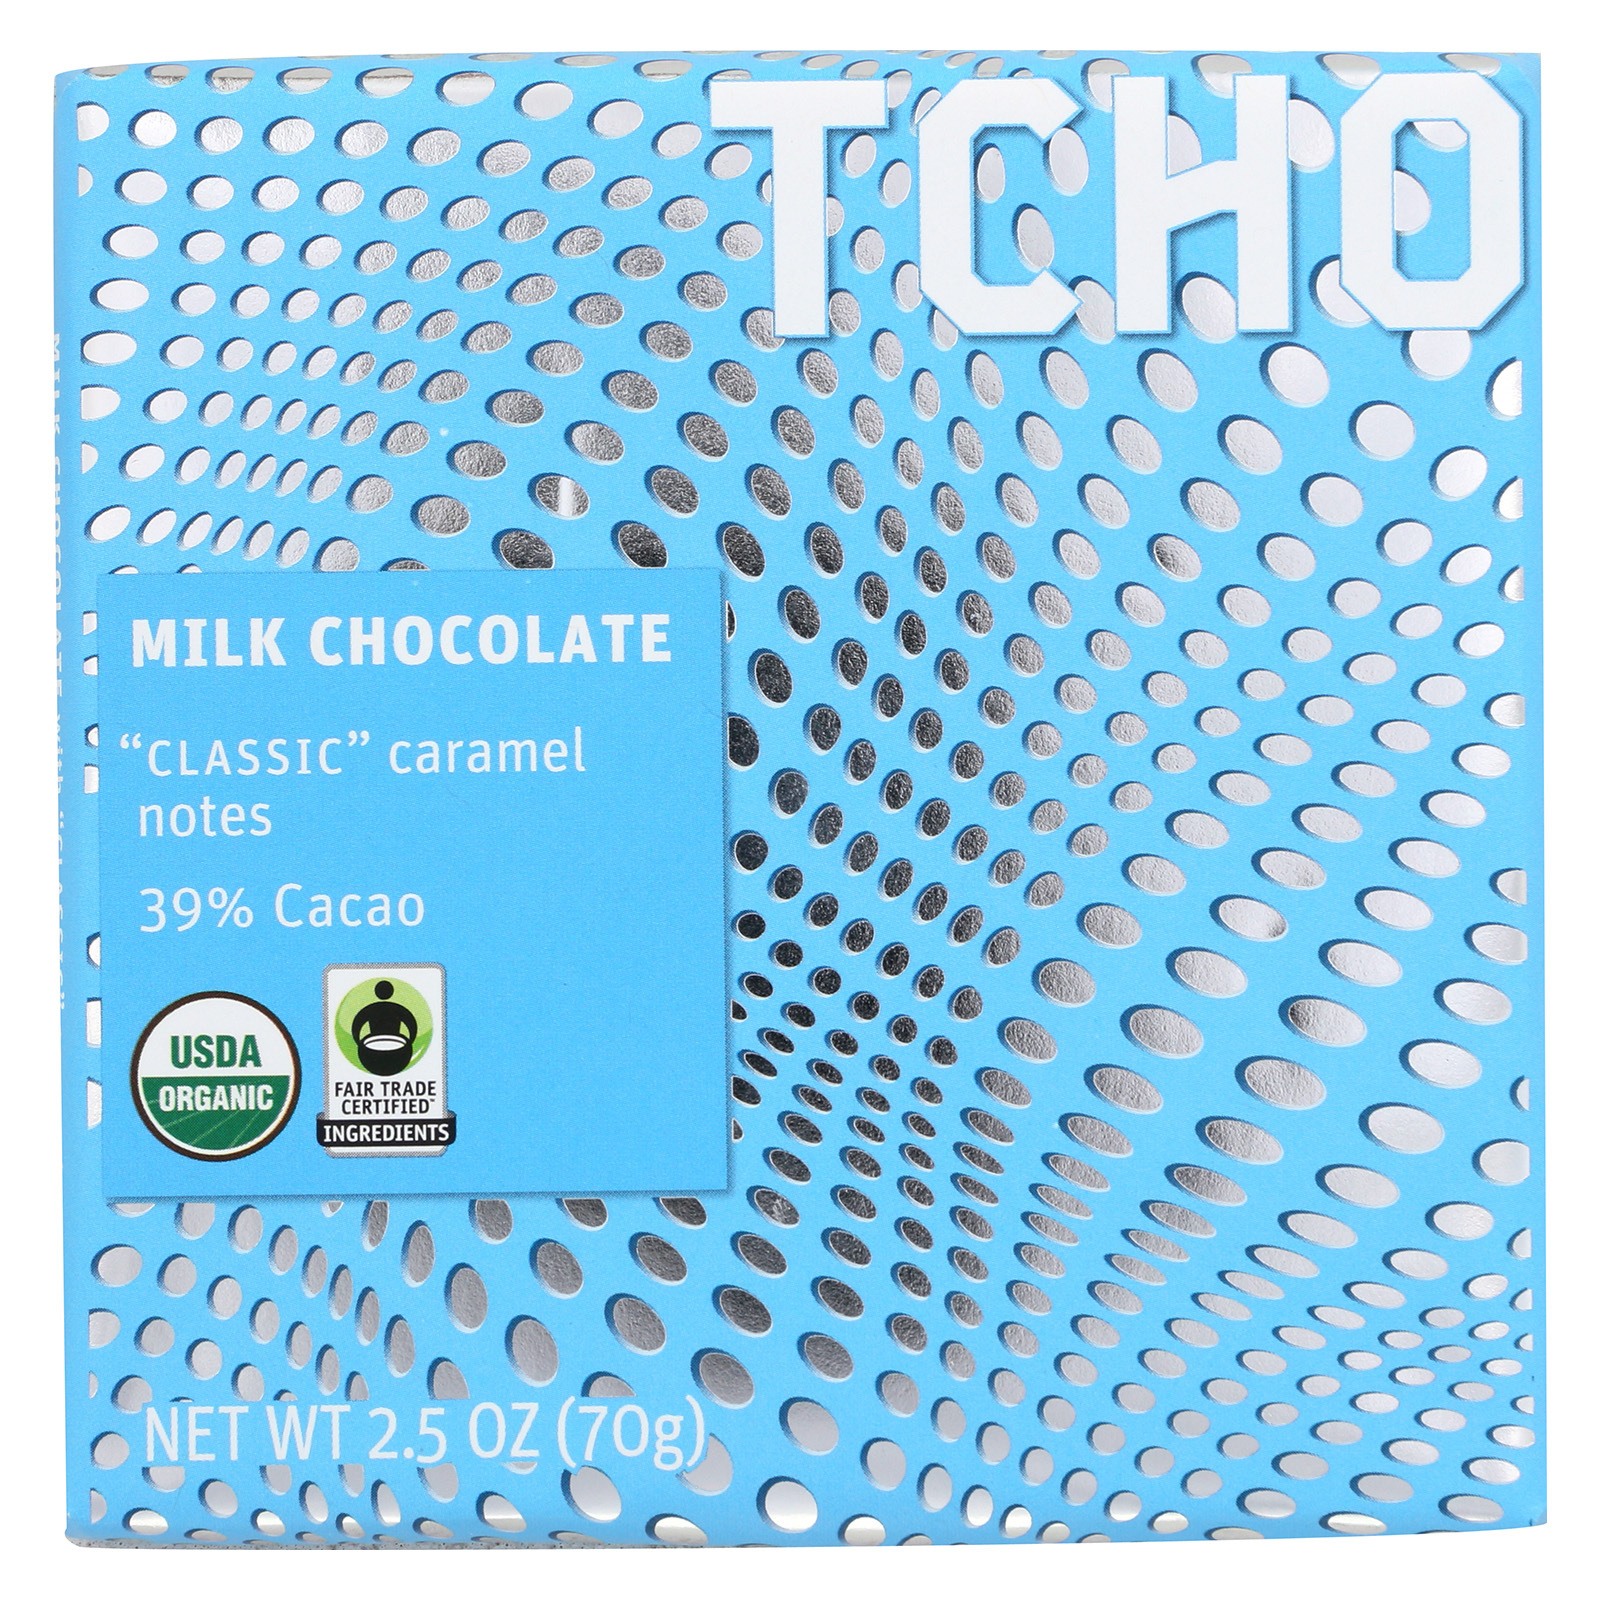 Tcho Chocolate Milk Chocolate Bar - Classic - Case of 12 - 2.5 oz.